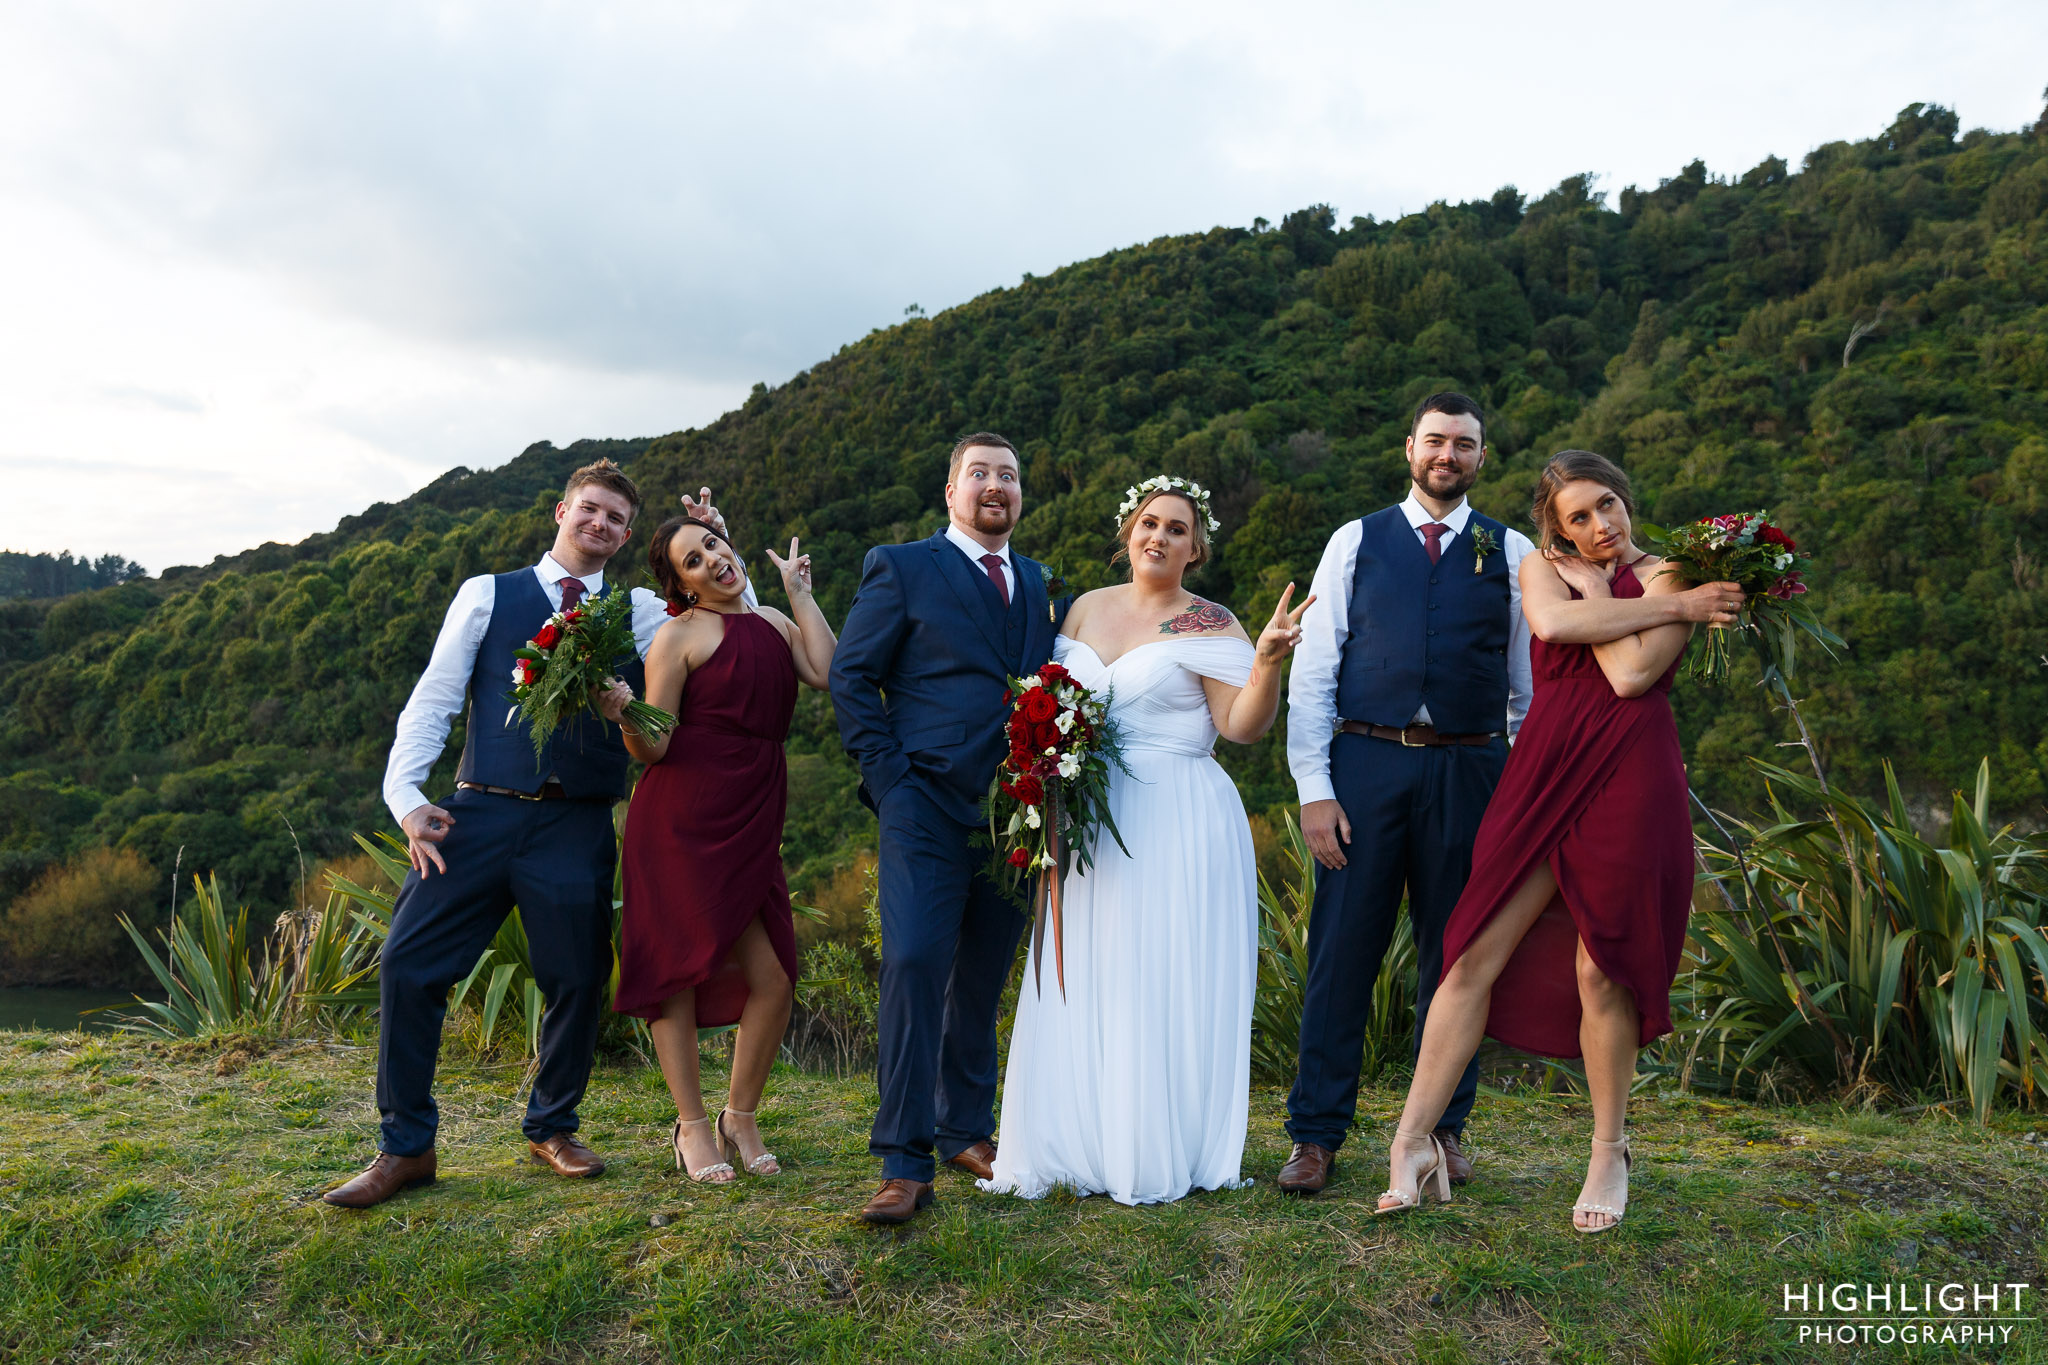 Highlight-wedding-photography-new-zealand-palmerston-north-96.jpg